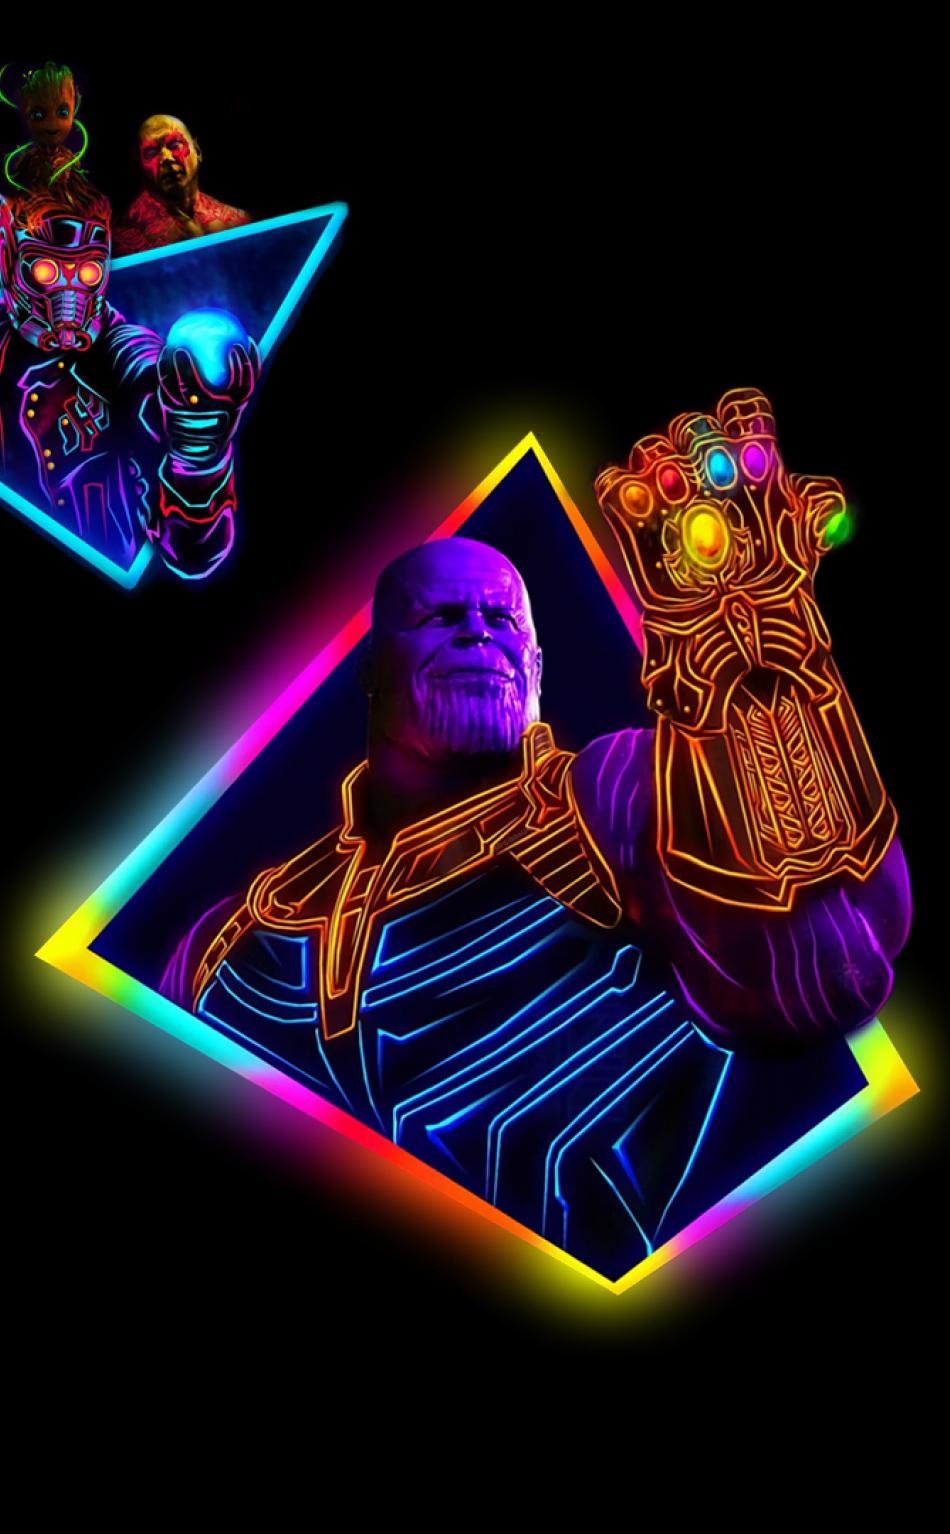 Avengers Infinity War 80s Neon Style Art, Full HD Wallpaper